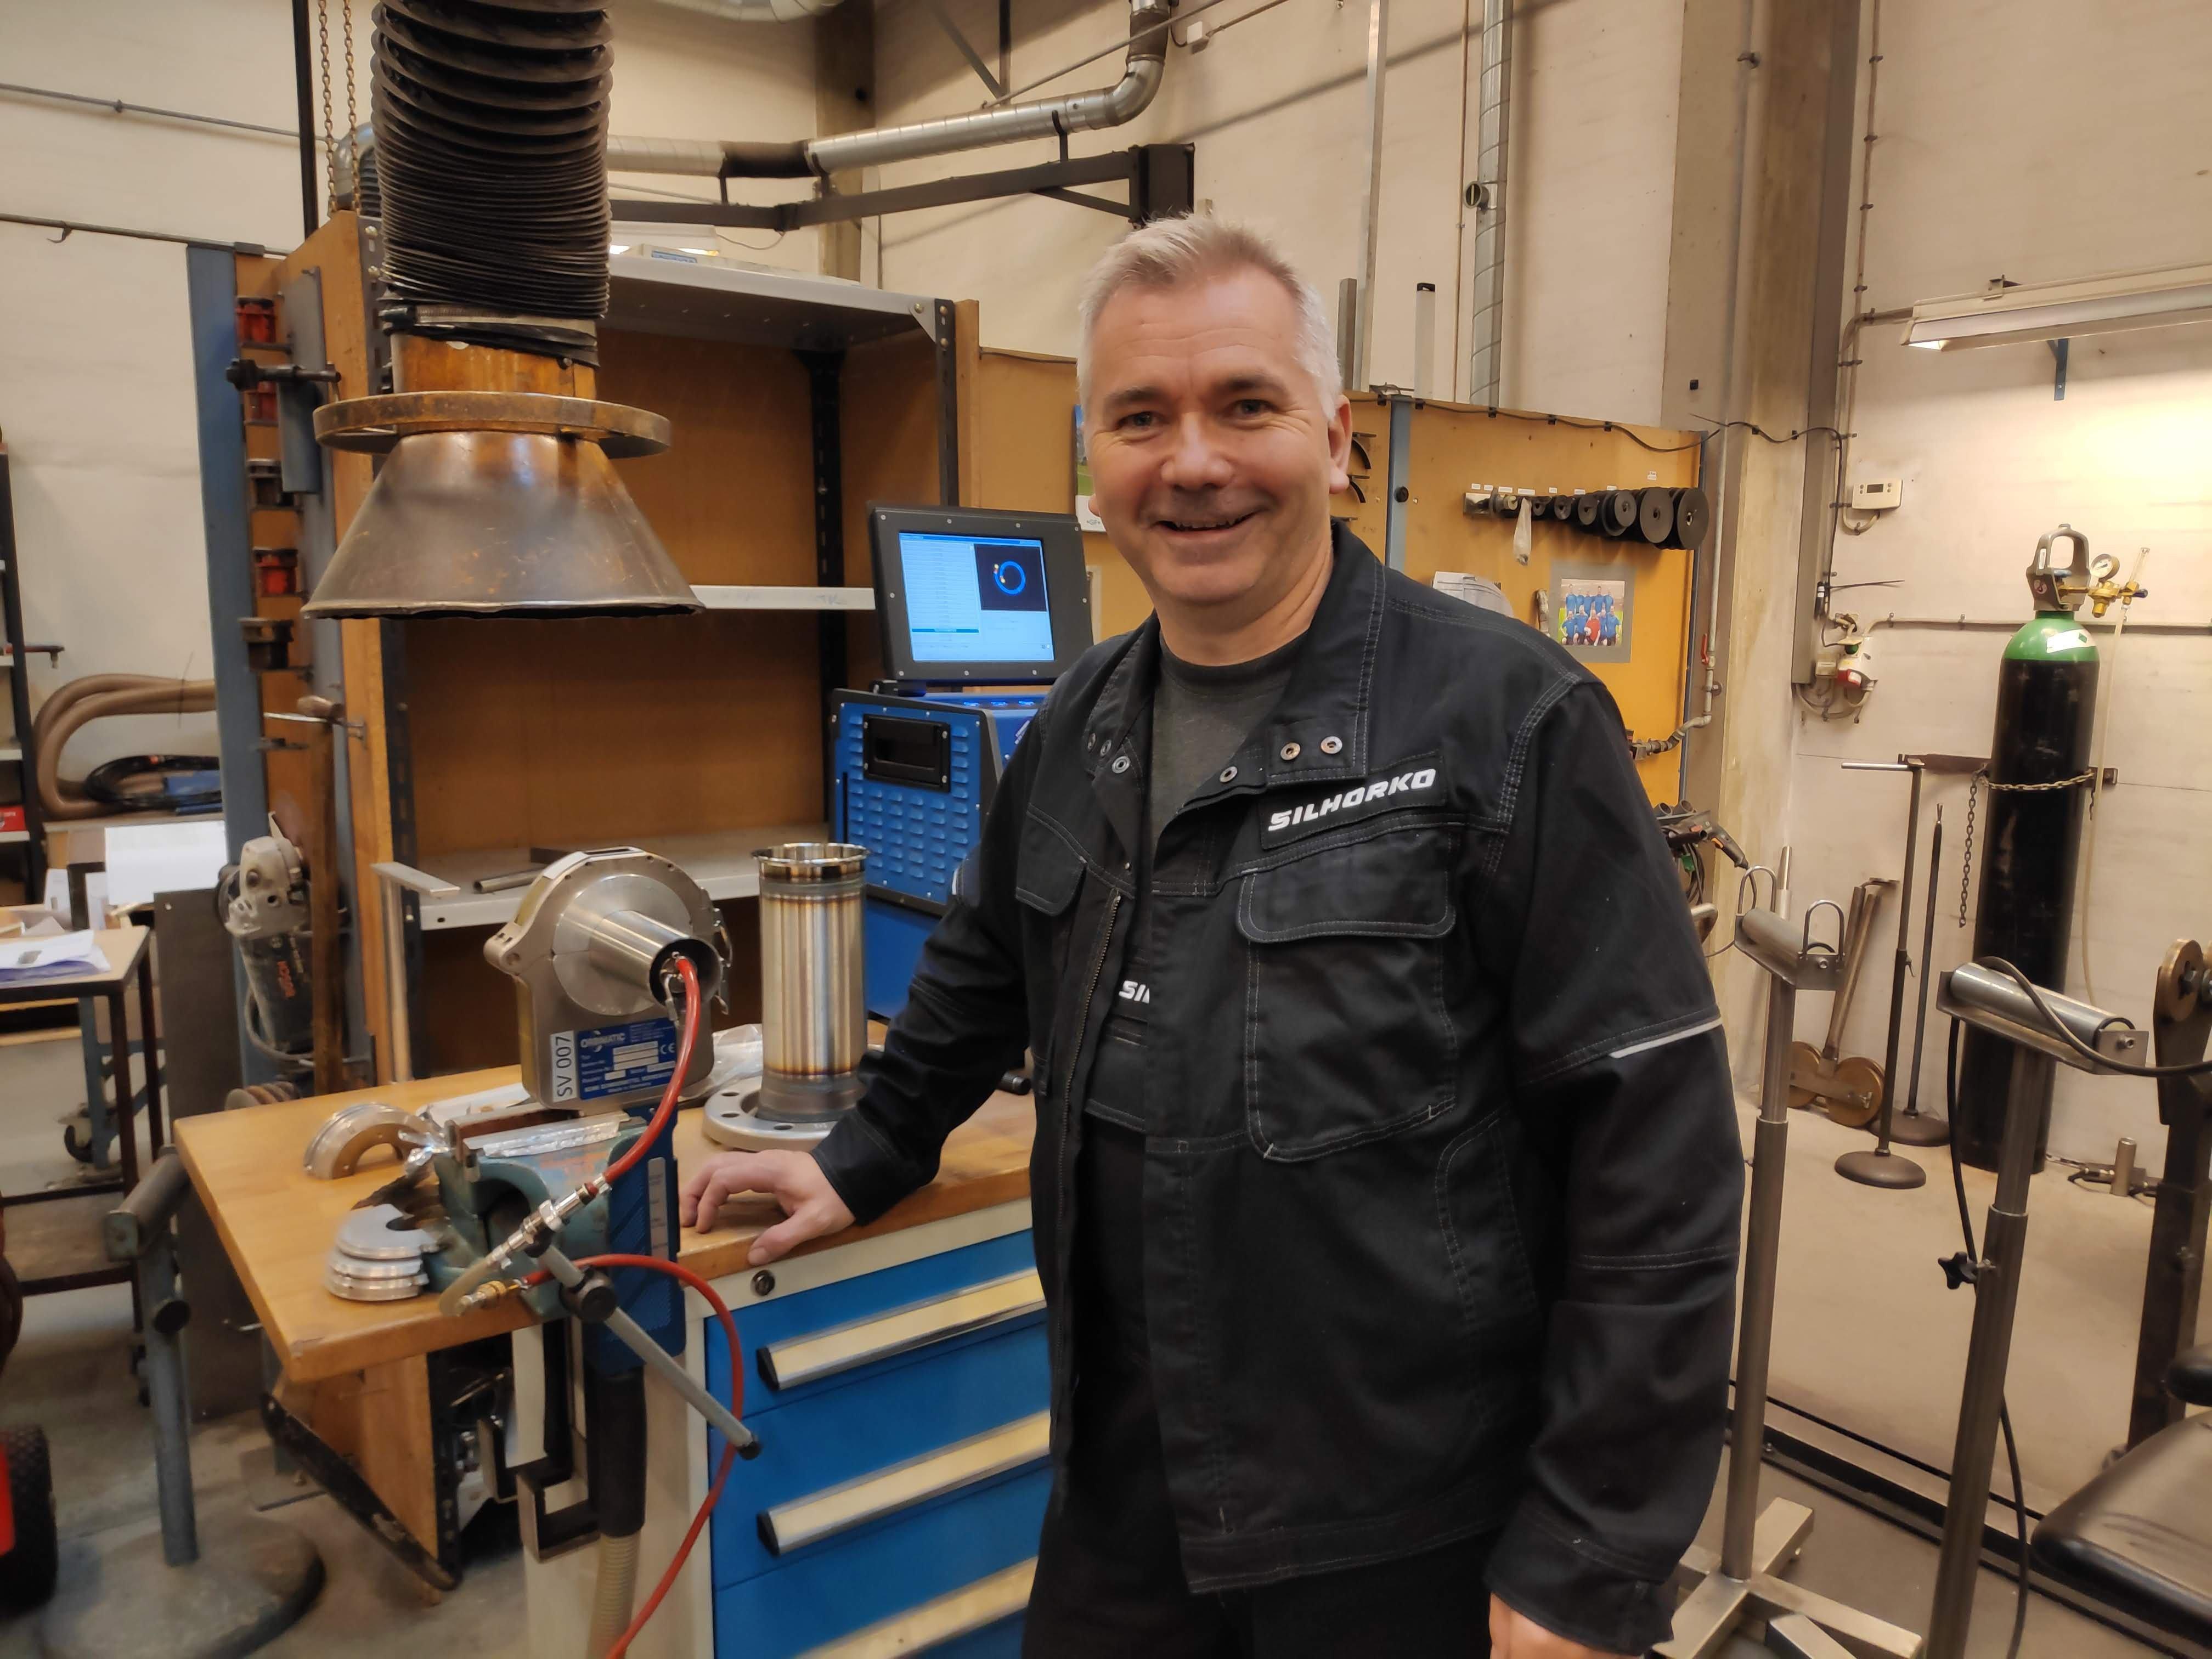 Henrik Christensen ved orbitalsvejseren hos Silhorko